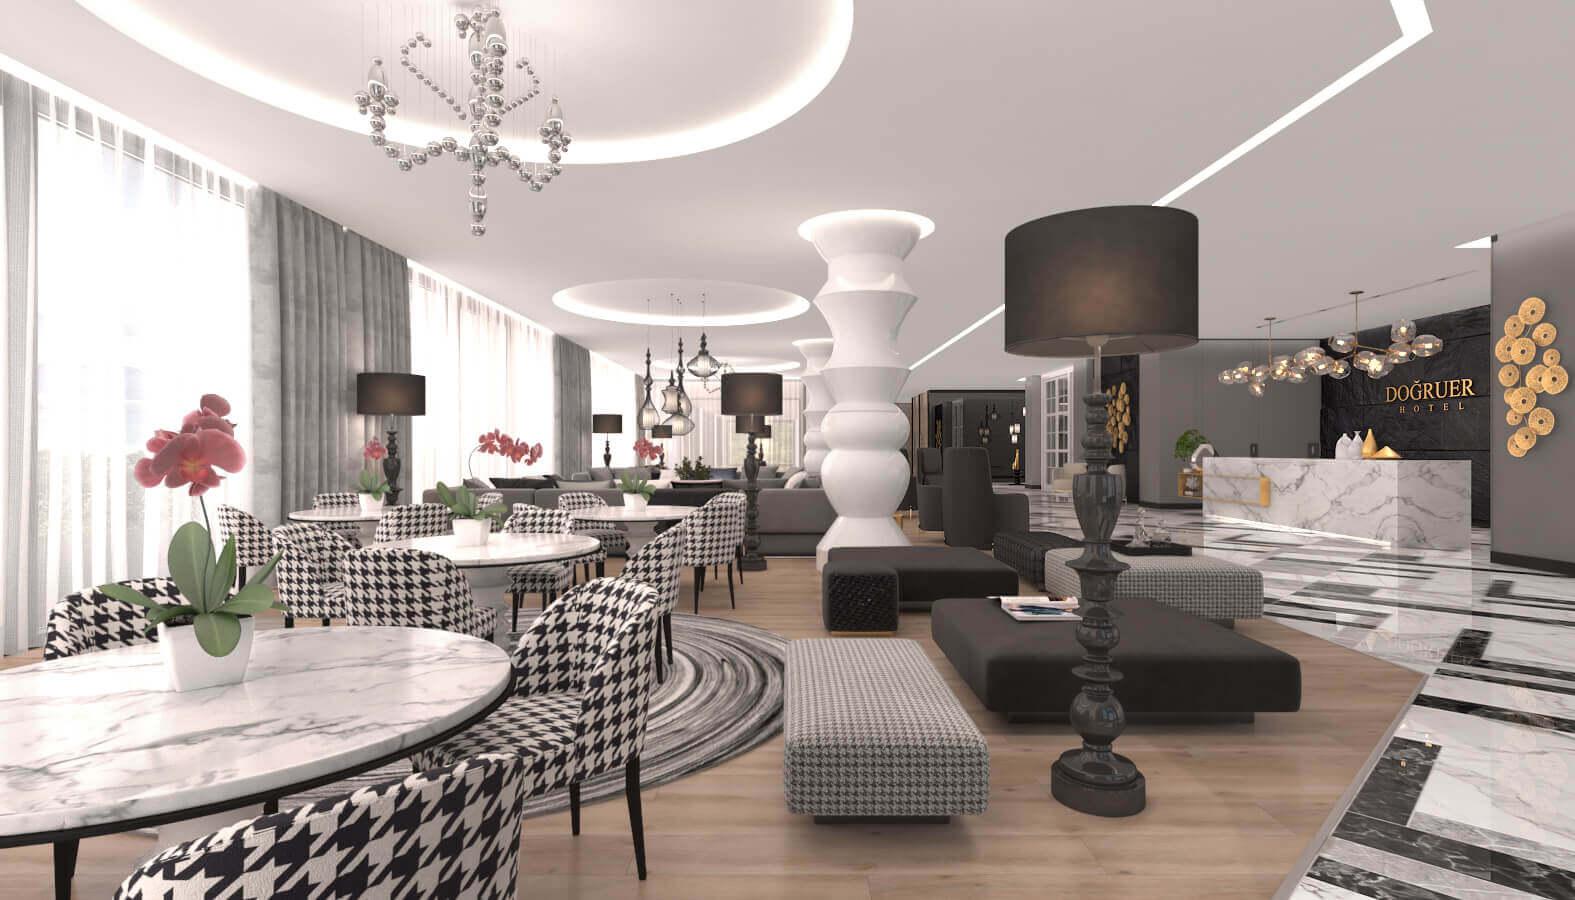 Lobby design 3585 Dogruer hotel Hotels